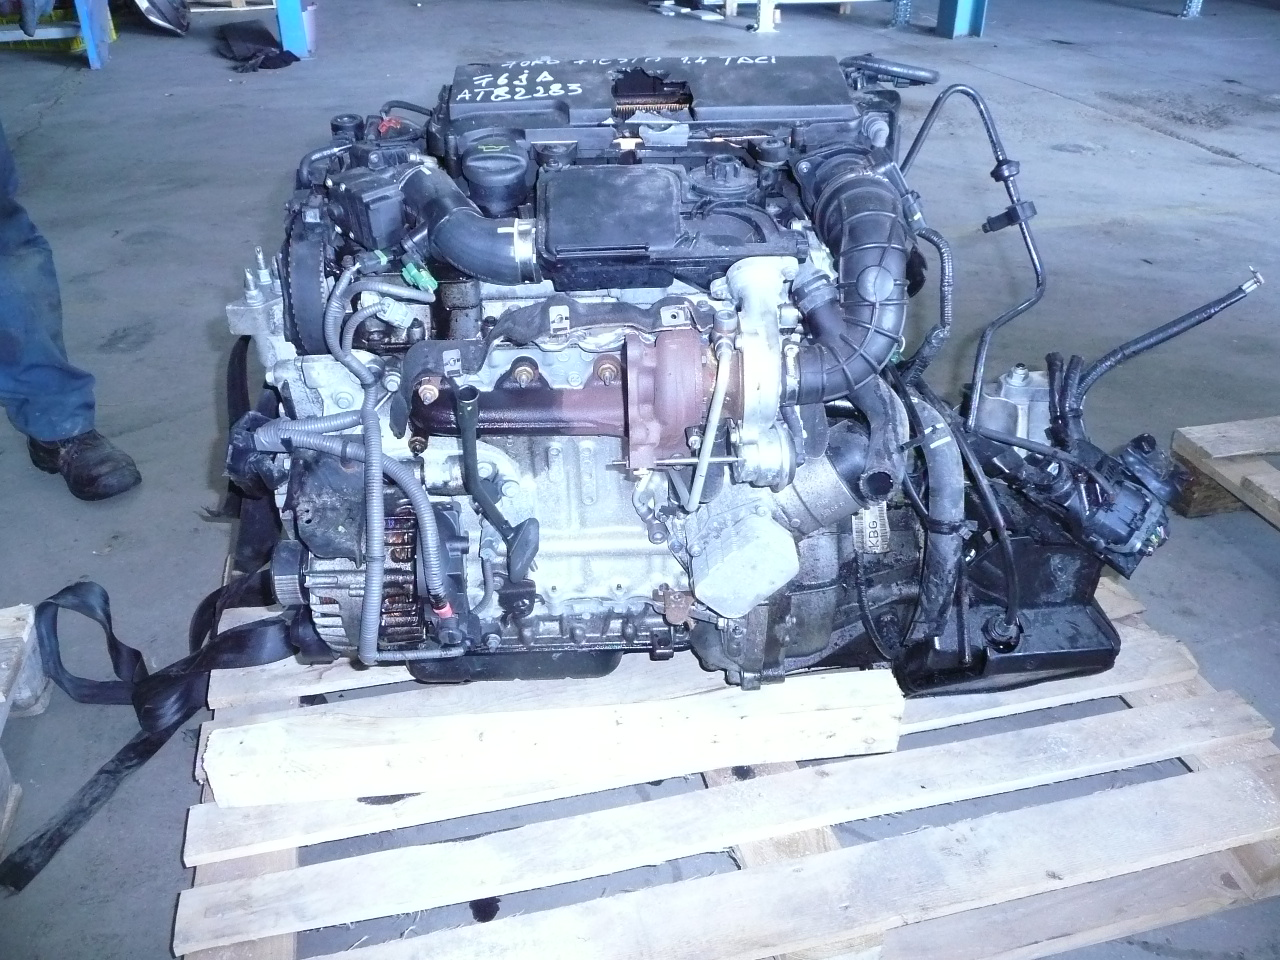 vand motor anexe motor alternator electromotor ford fiesta 27 februarie 2012 dezmembrari. Black Bedroom Furniture Sets. Home Design Ideas